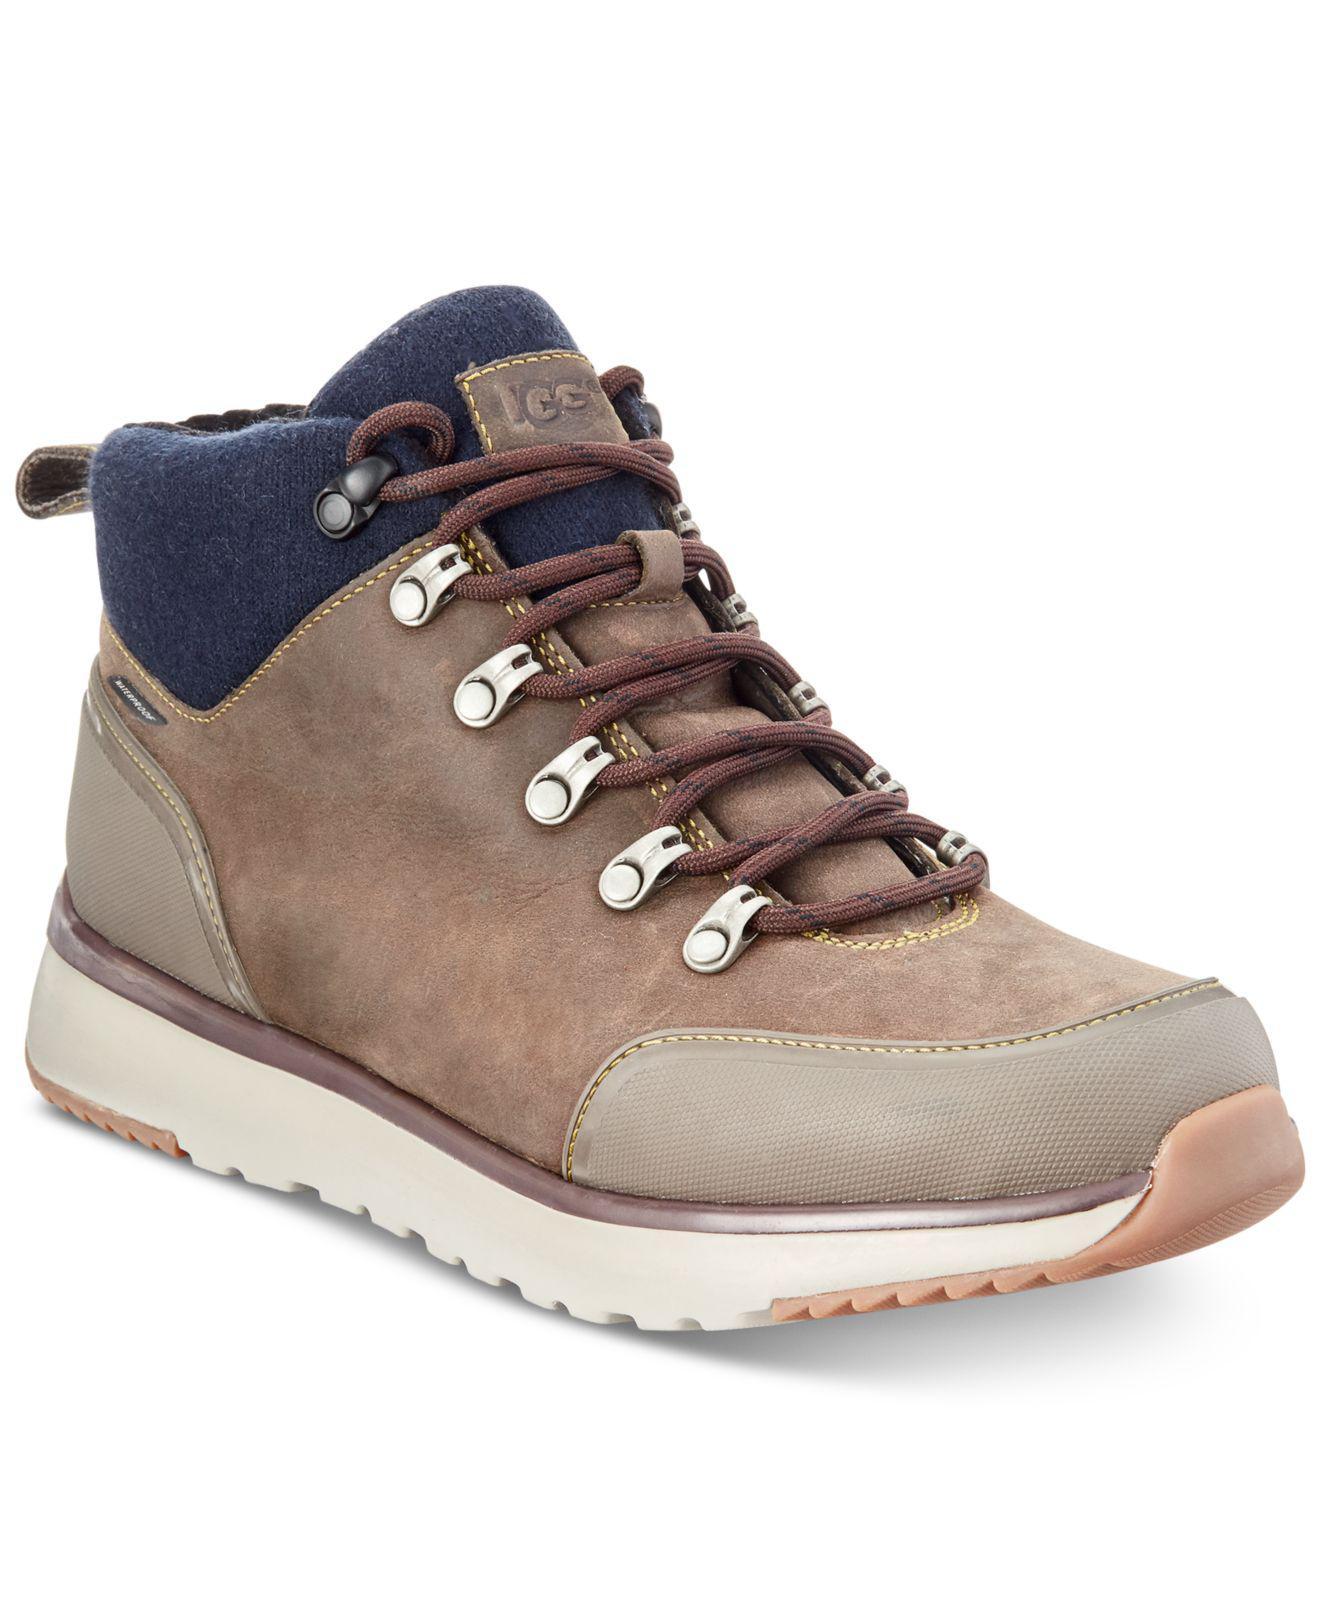 dc0c472d3e1 Men's Olivert Waterproof Boots